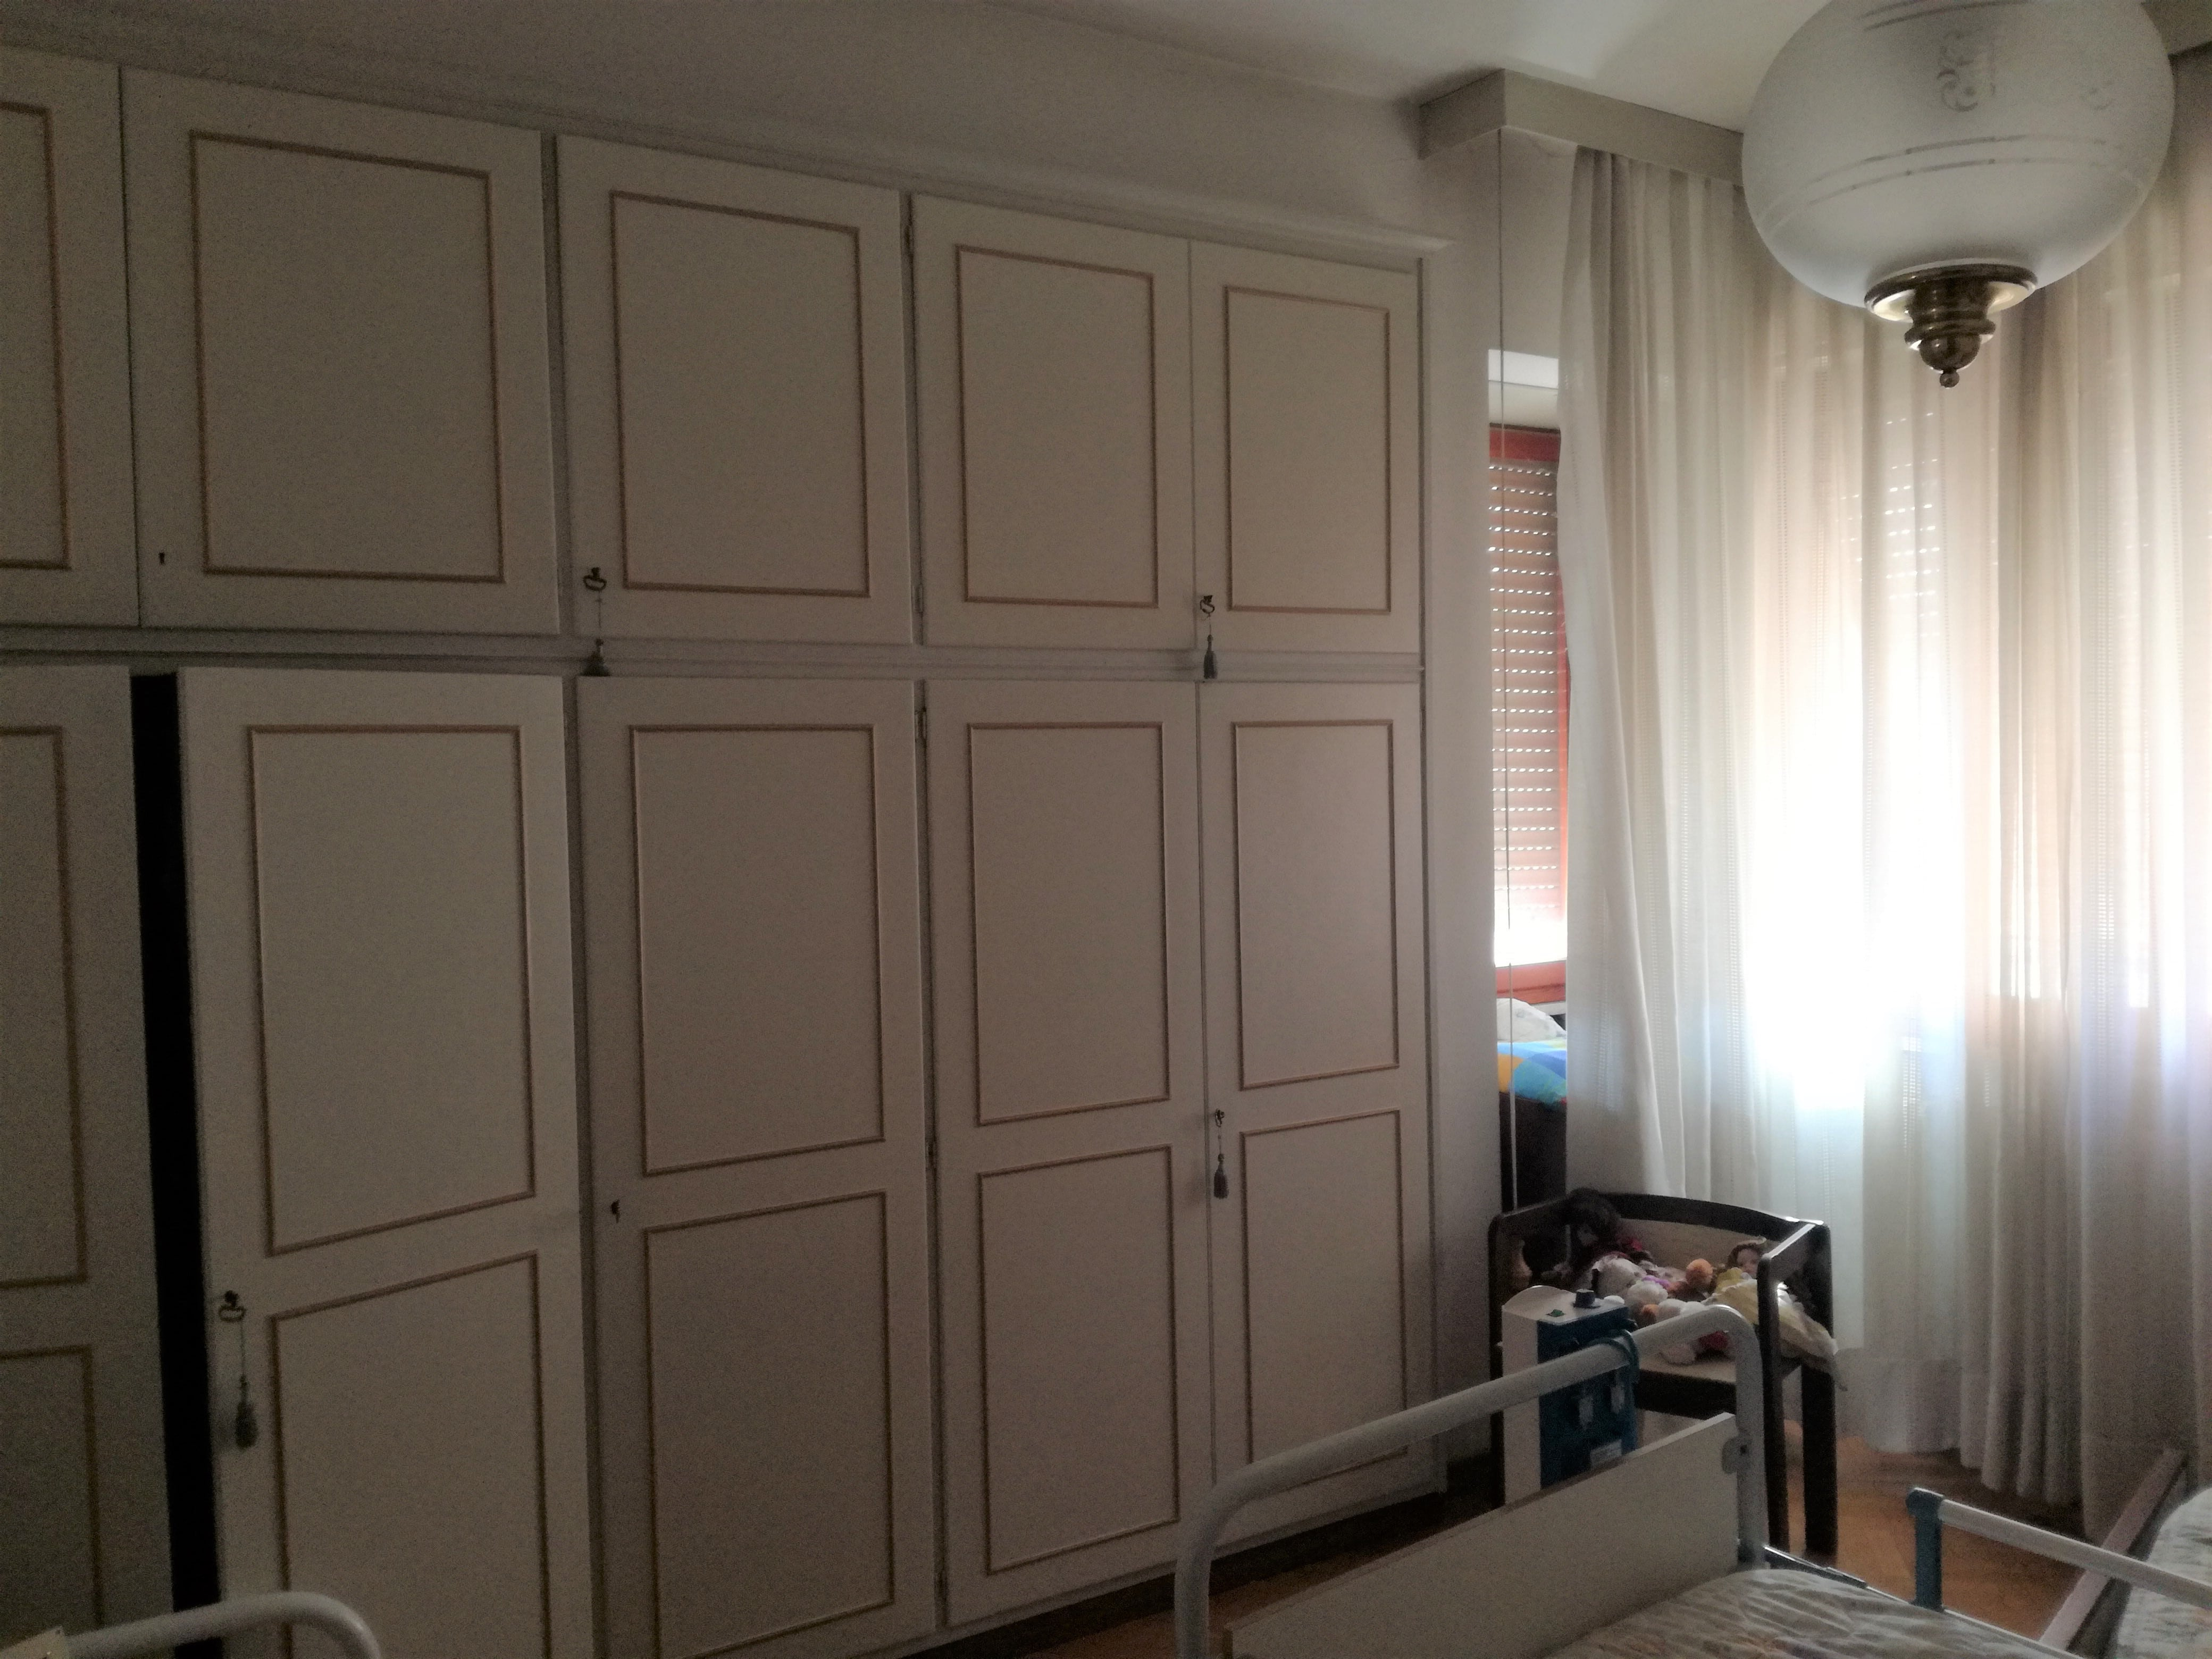 PISTOIA NUOVA,PISTOIA,51100,3 Bedrooms Bedrooms,1 BagnoBathrooms,Appartamento,PISTOIA NUOVA,1454